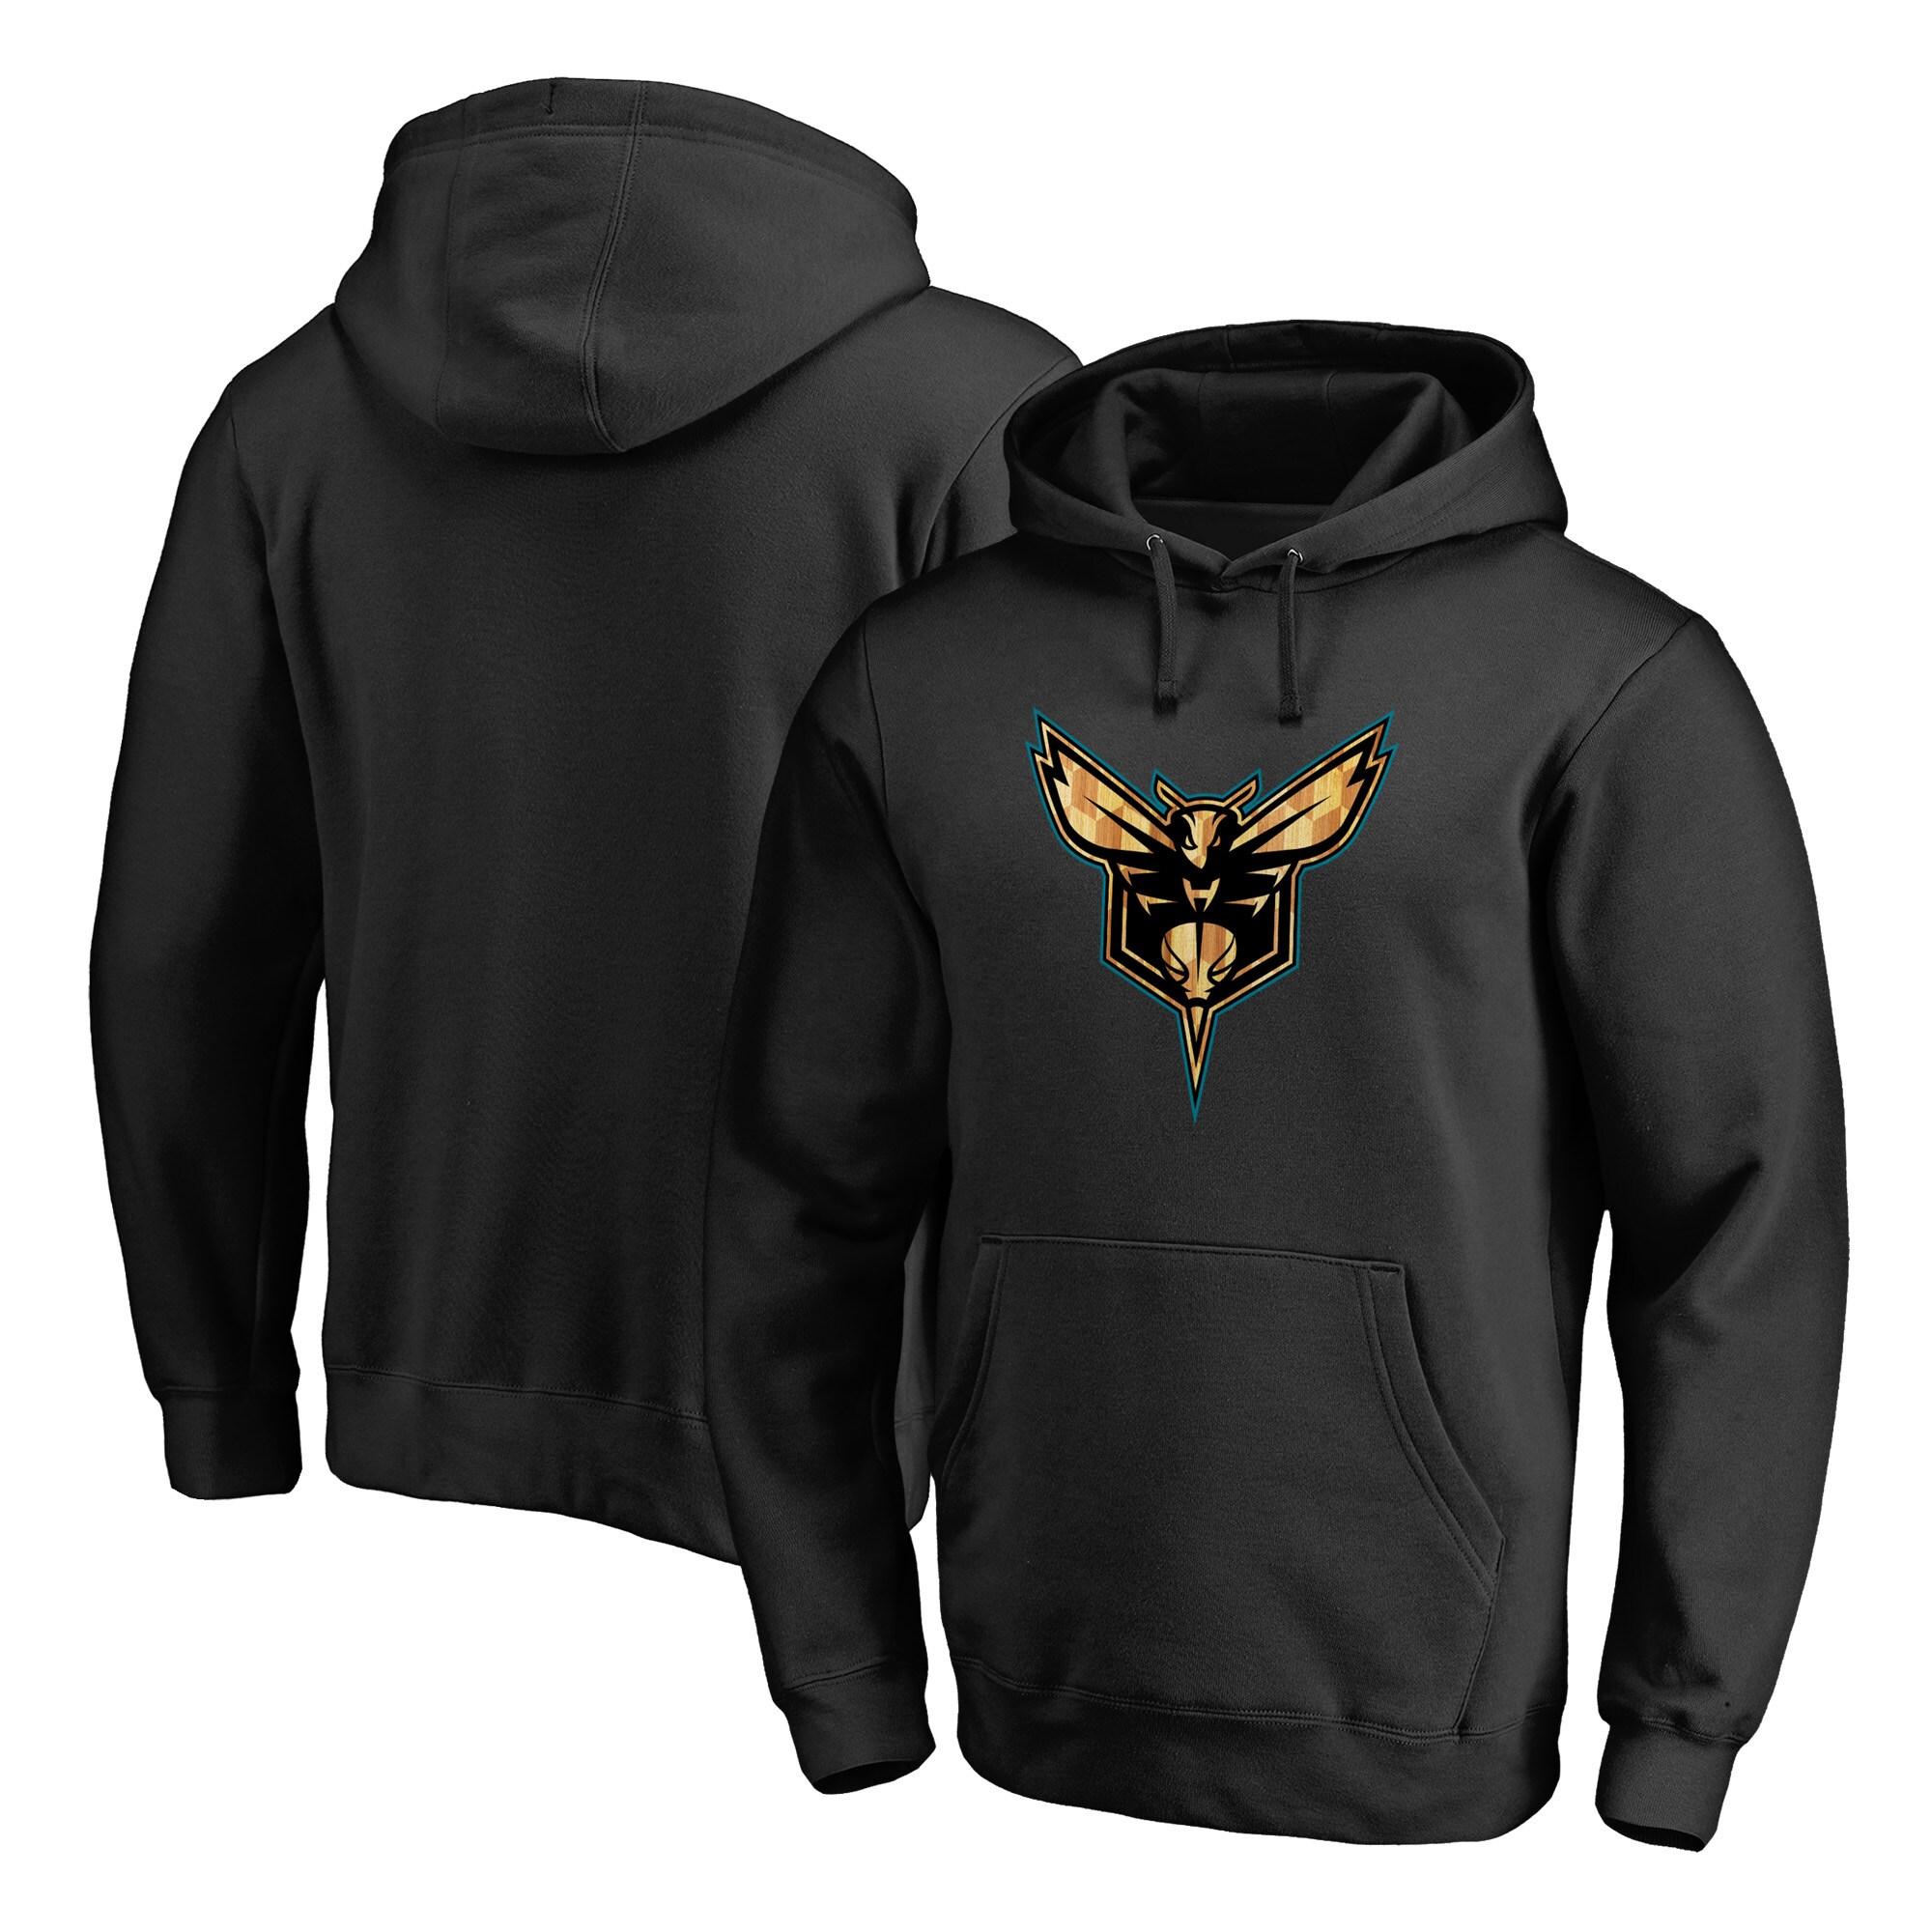 Charlotte Hornets Fanatics Branded Hardwood Pullover Hoodie - Black